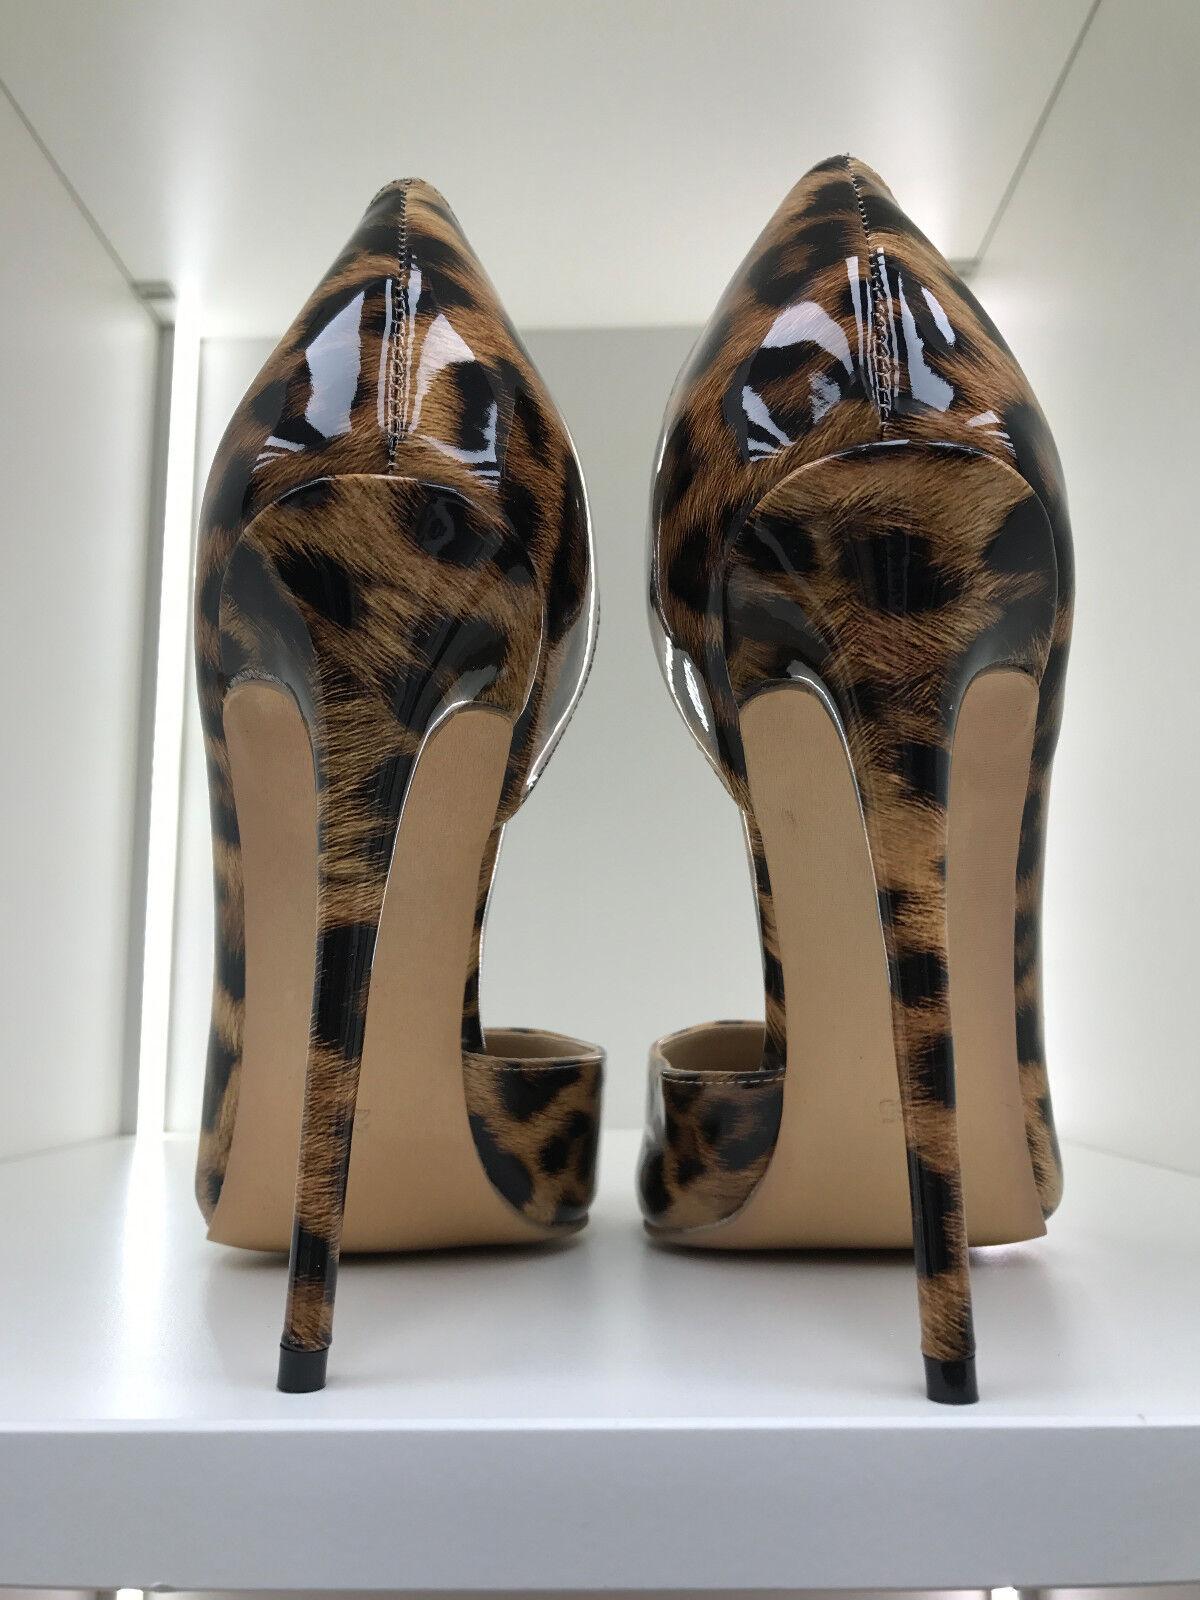 13cm Sexy sky high heels patent  leopard pumps low cut fetish high heels US12 43